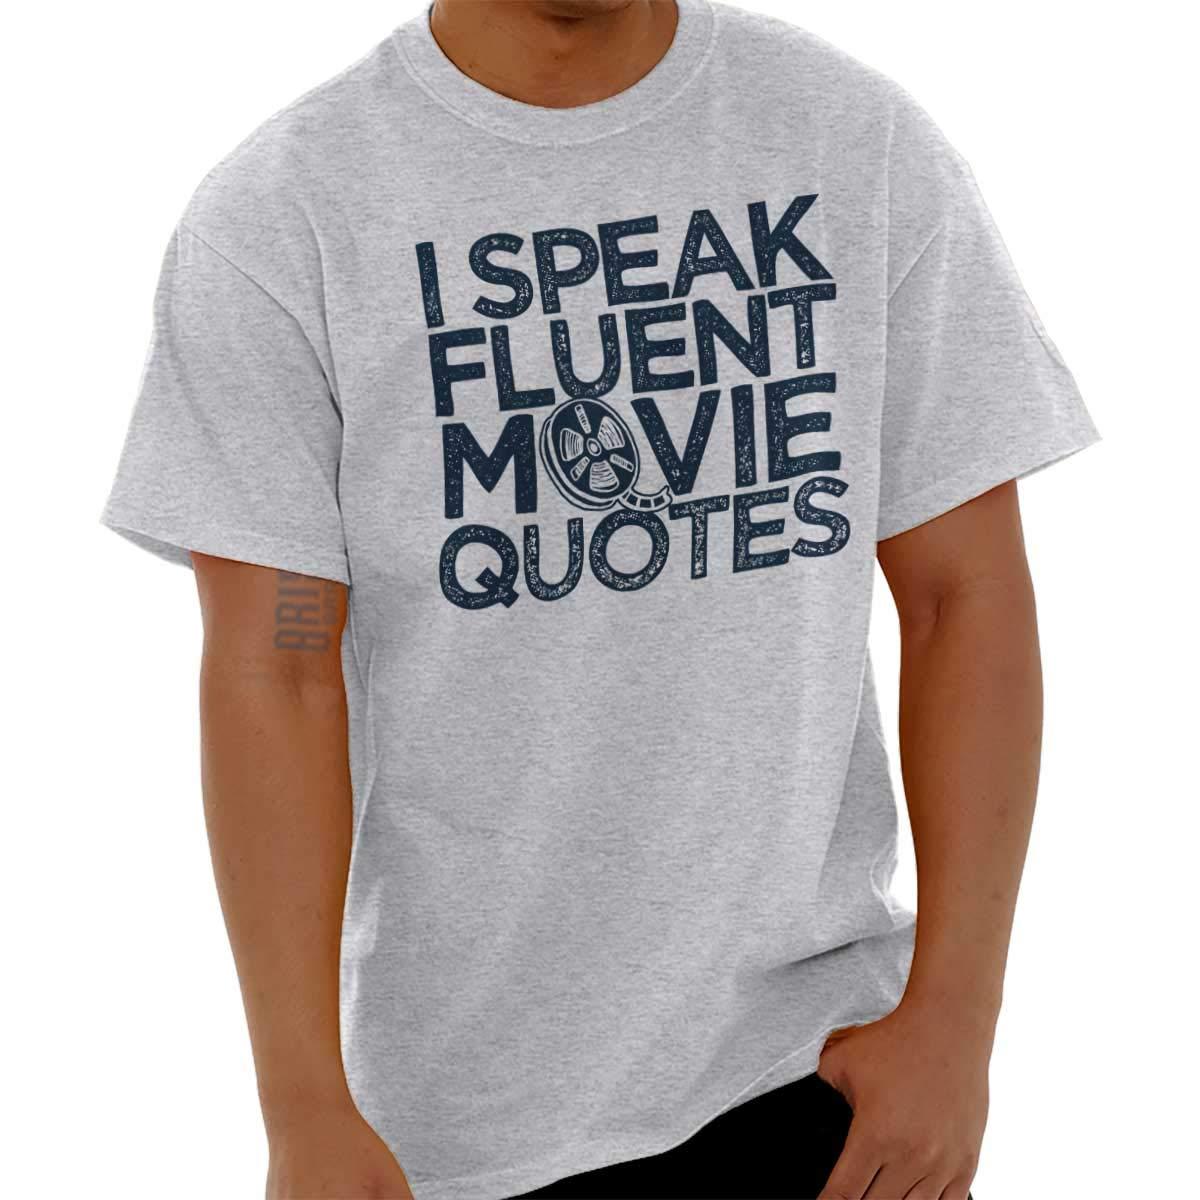 Brisco Brands Fluent Movie Quotes Funny Shirt Idea Sarcastic Cute T-Shirt Tee